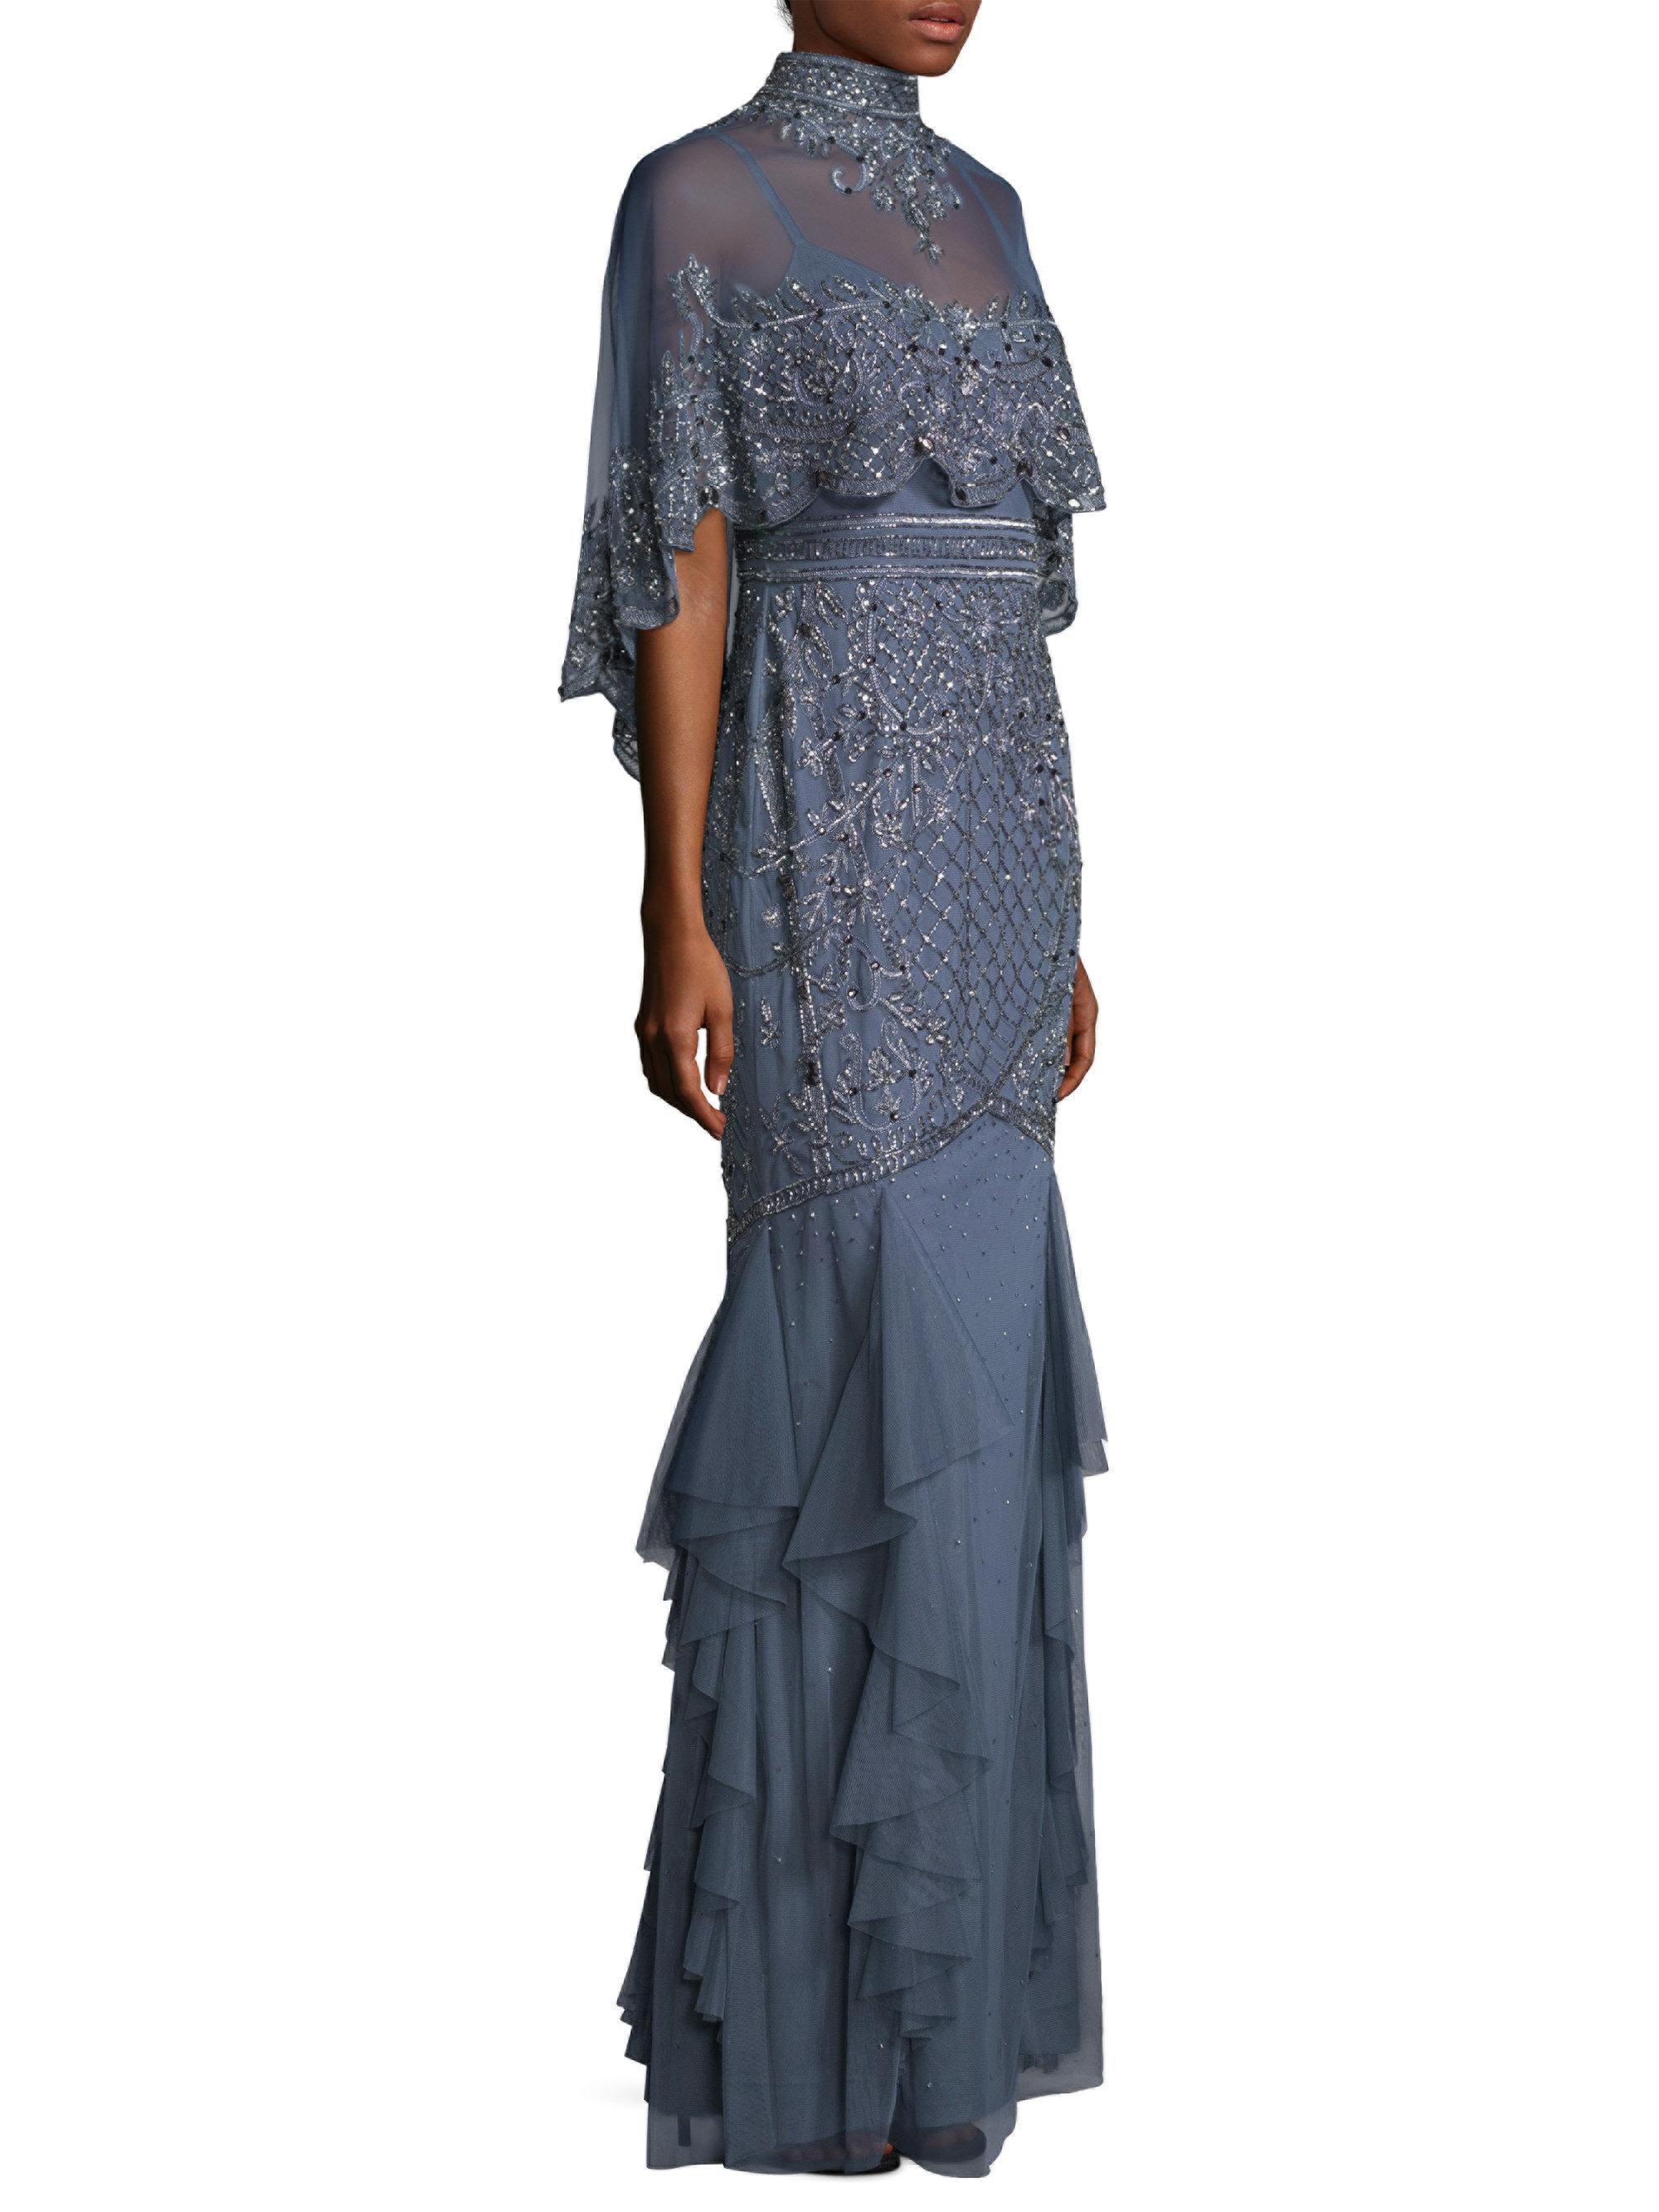 Lyst - Aidan Mattox Capelet Floor-length Dress in Blue